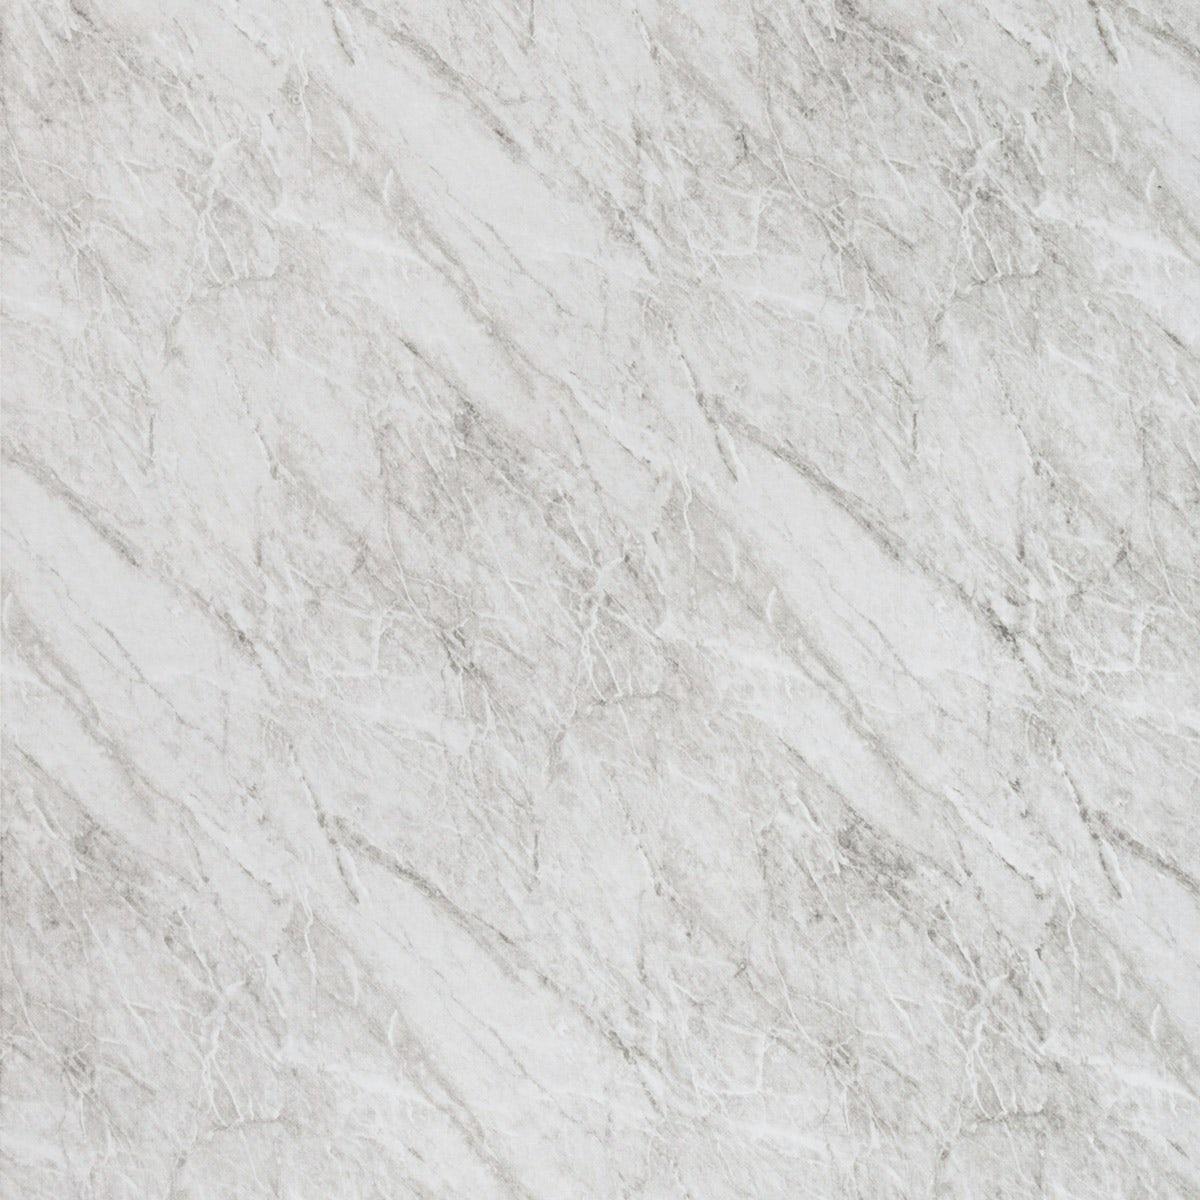 Multipanel Economy Roman Marble shower wall single panel 1000mm